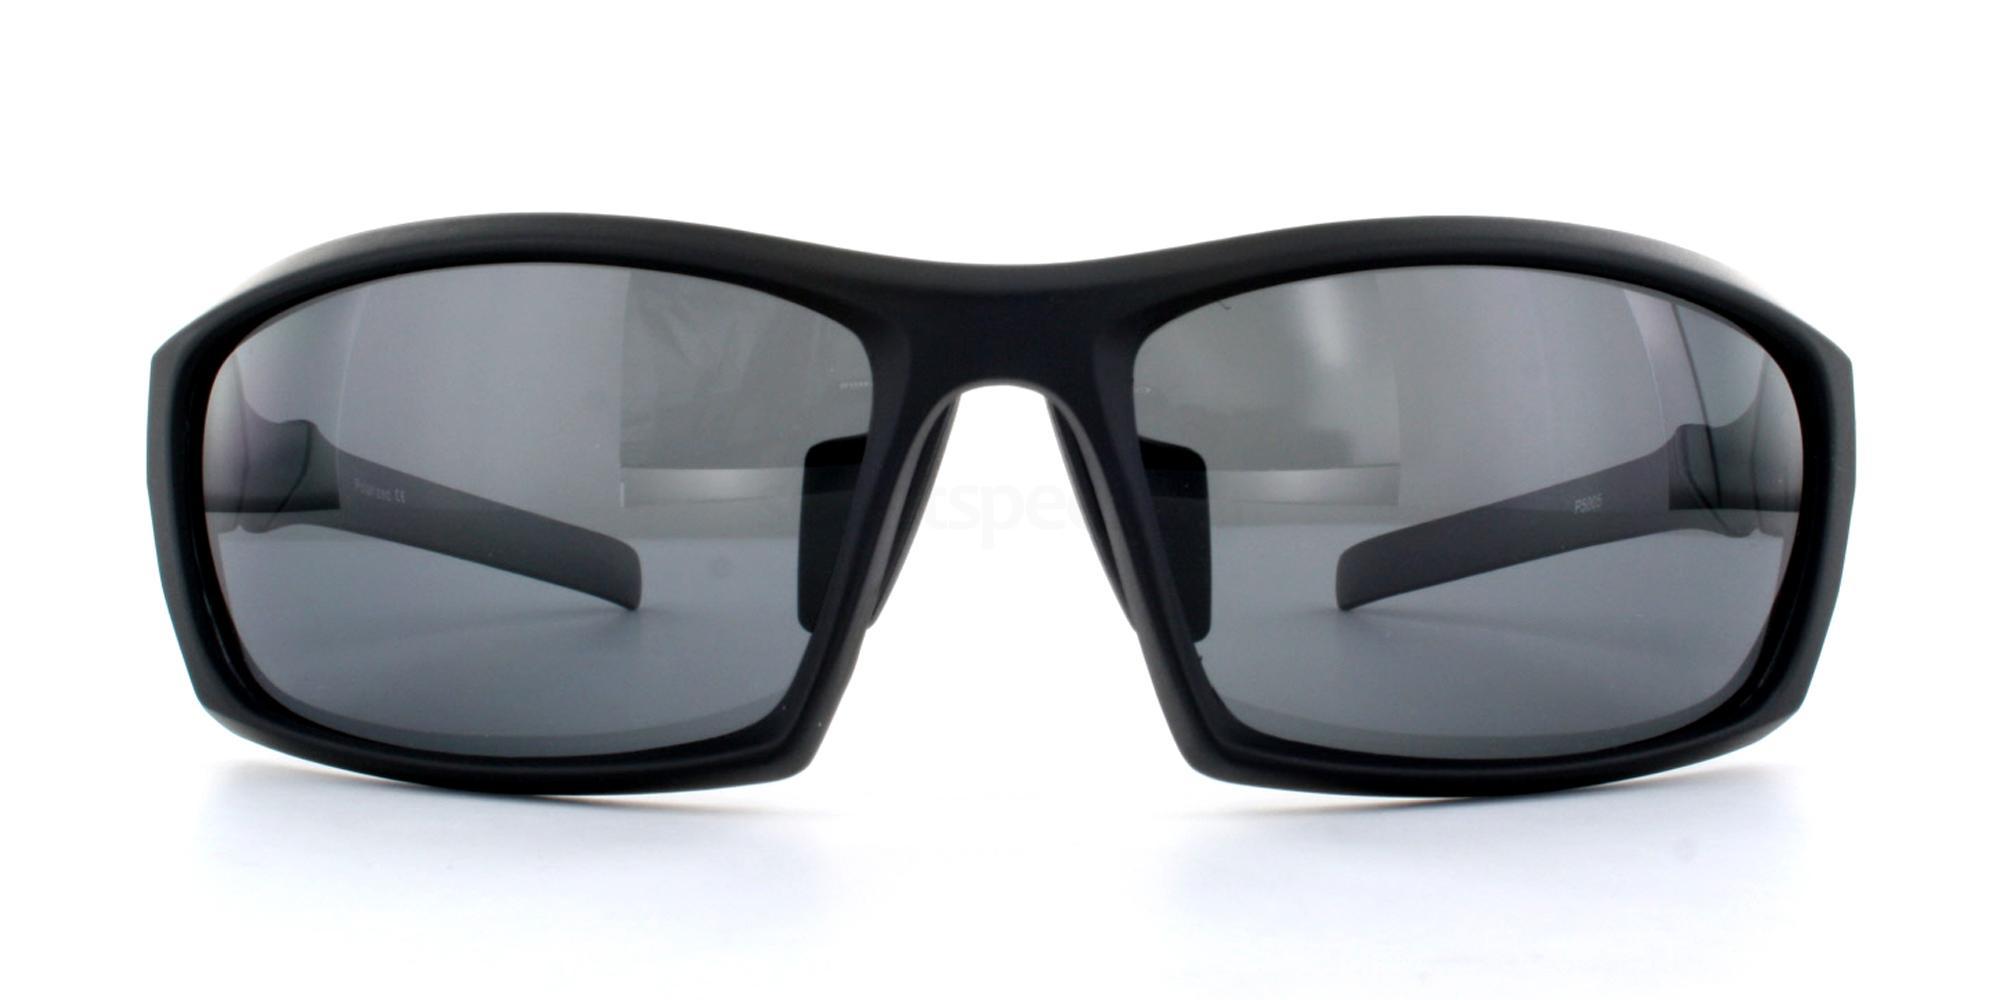 Matte Black + Grey Lens P5005 Sunglasses, Aero